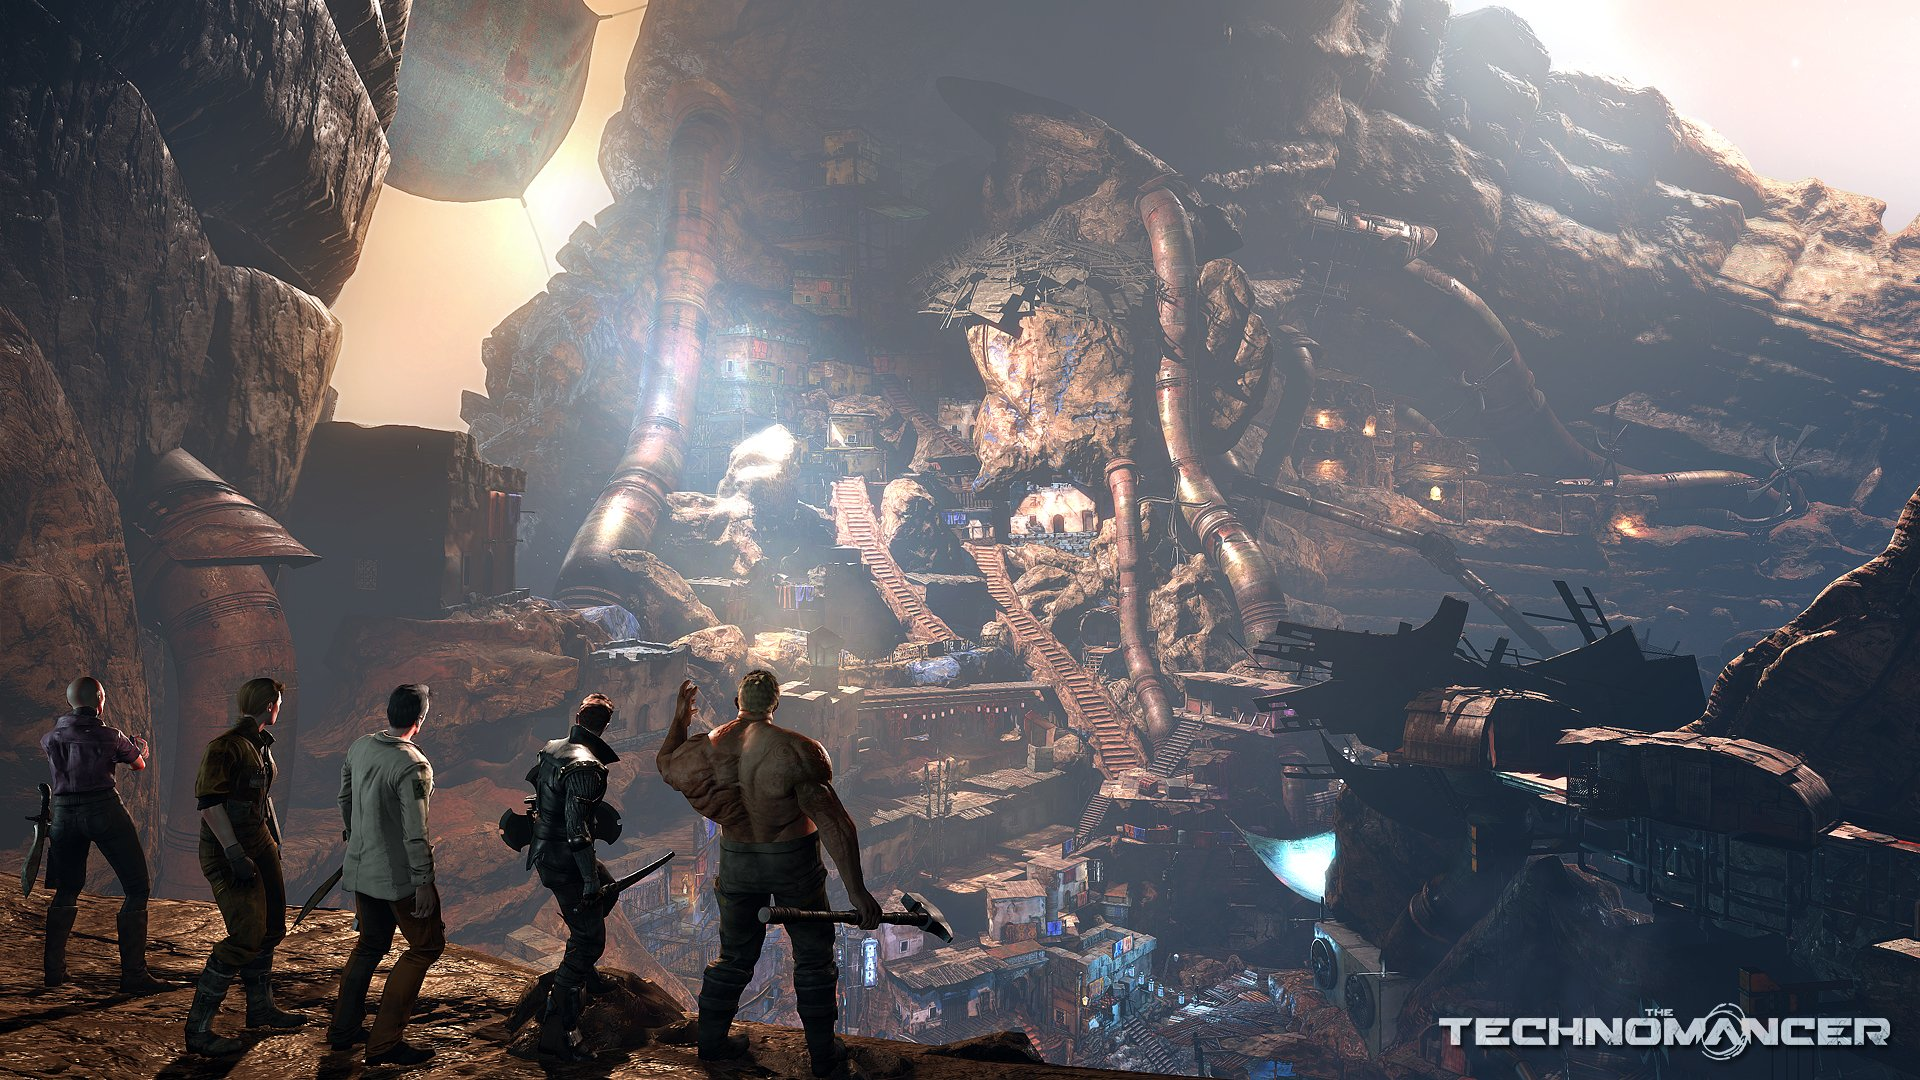 The Technomancer Screenshots ~ PS4, Xbox One & PC. - Изображение 1